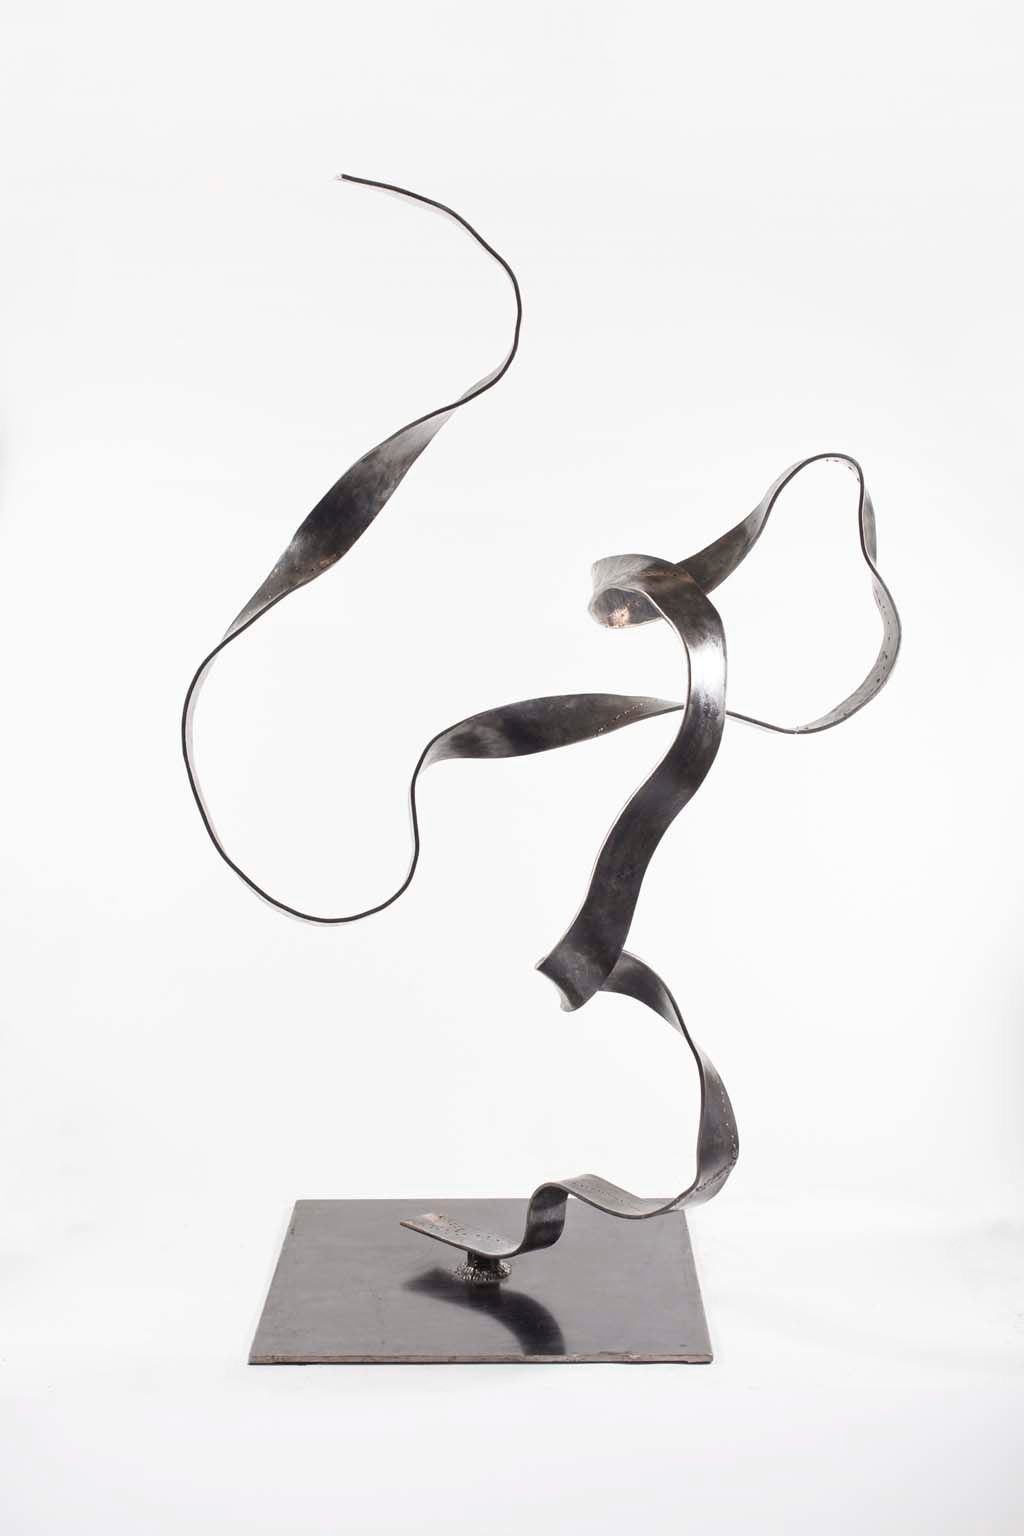 Oblivion VI |2016 | Iron & brass Sculpture| 160x120x110 cm | Rami Ater